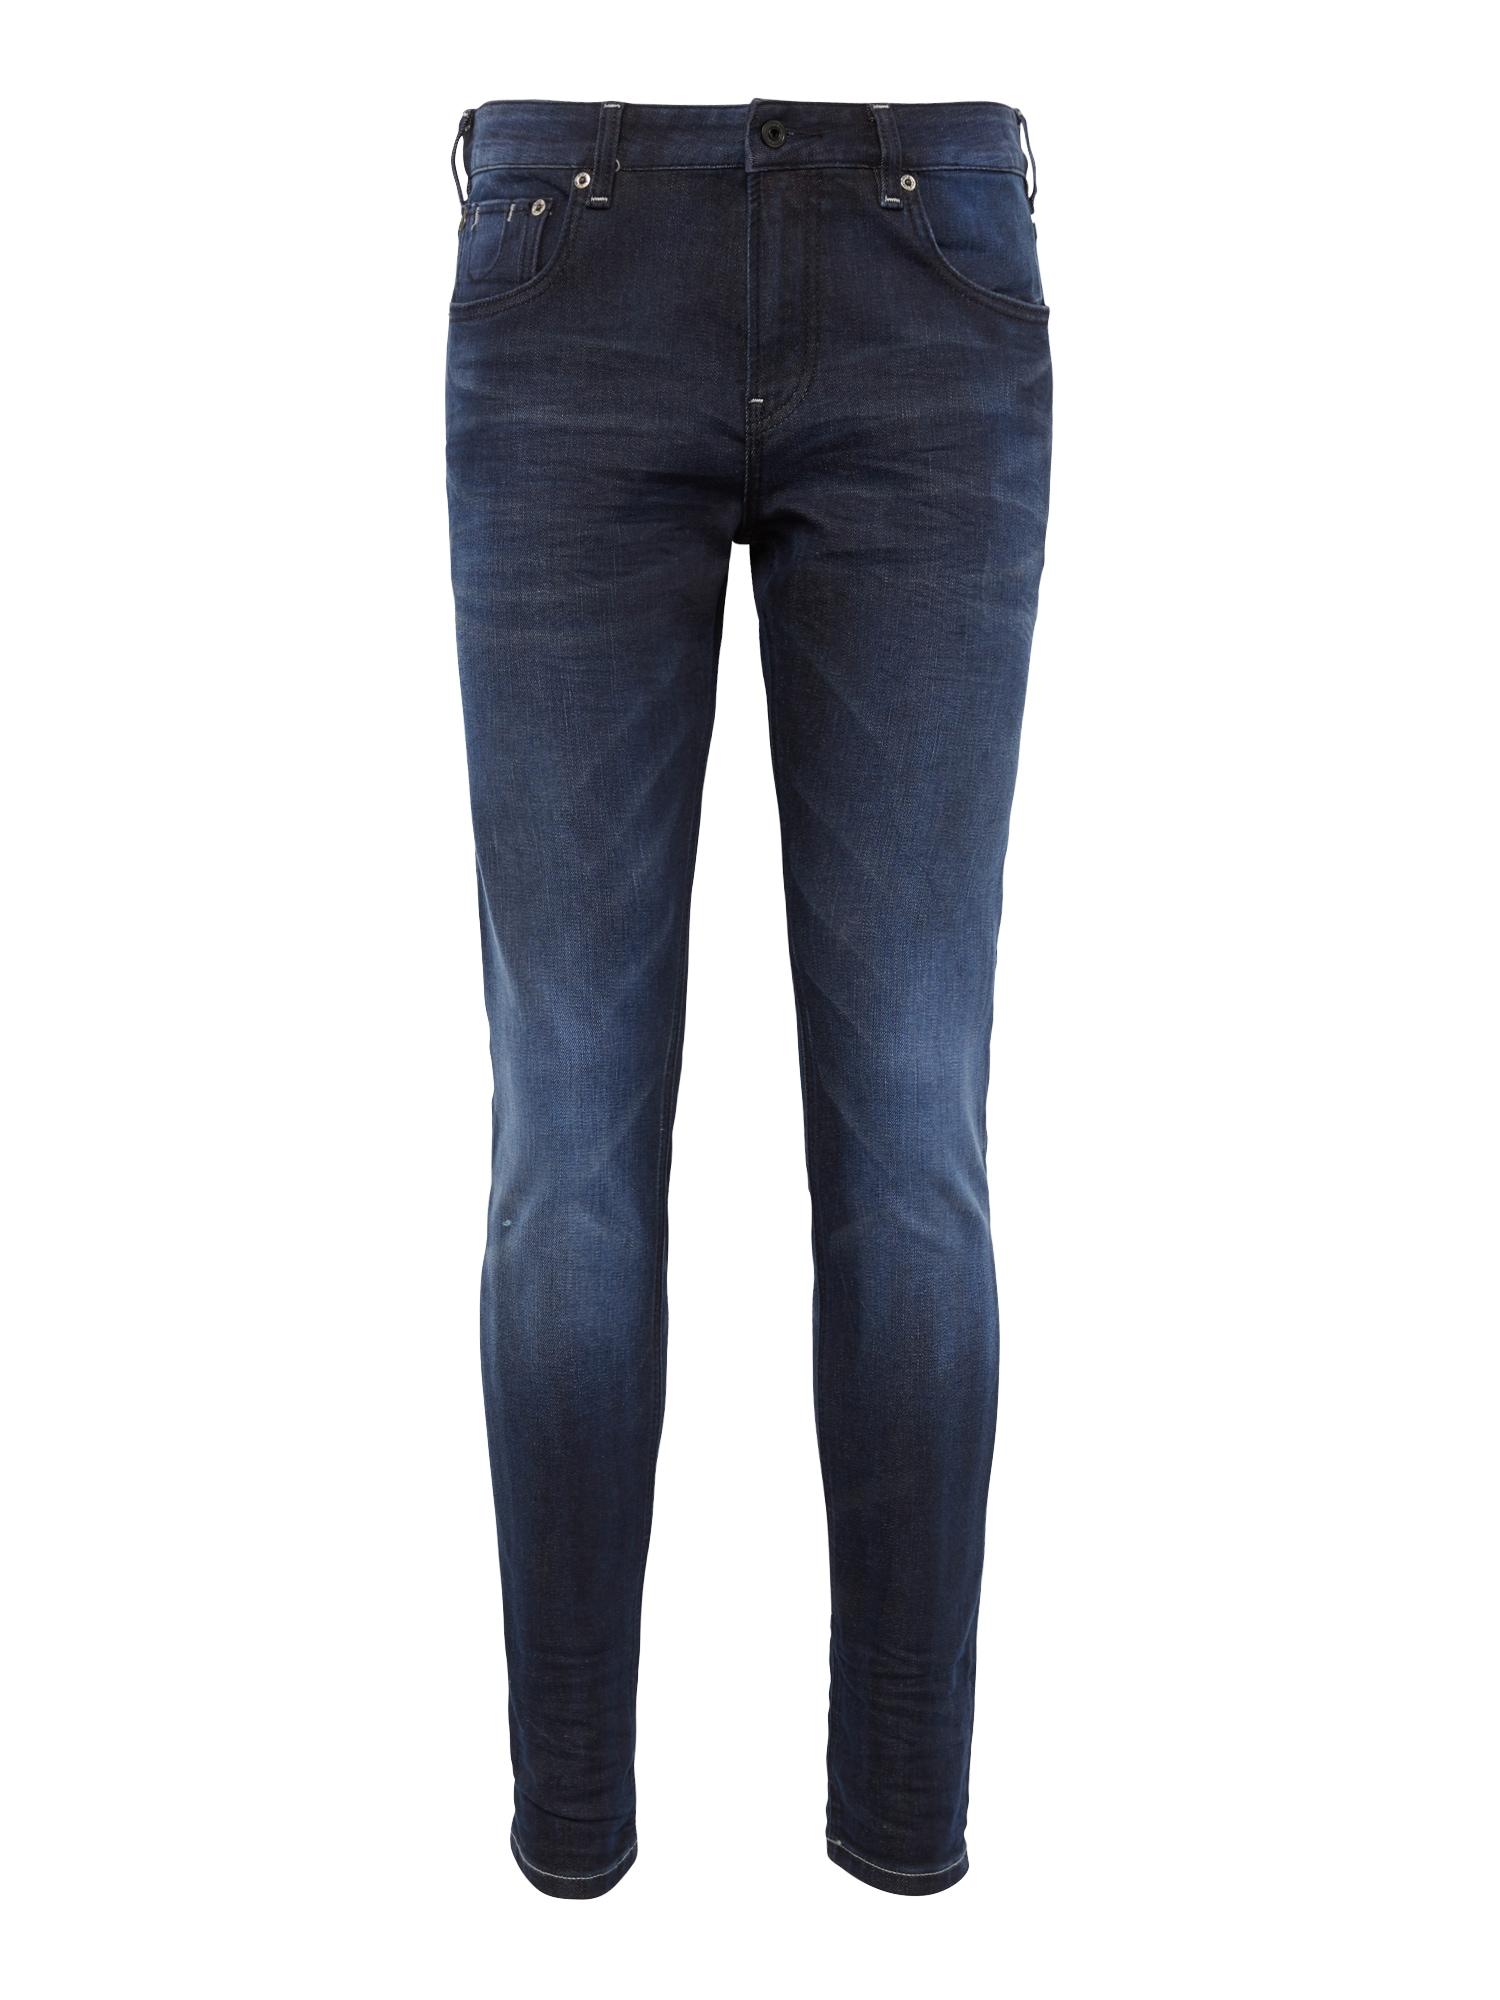 SCOTCH  and  SODA Heren Jeans Skim Blauw Me Away donkerblauw